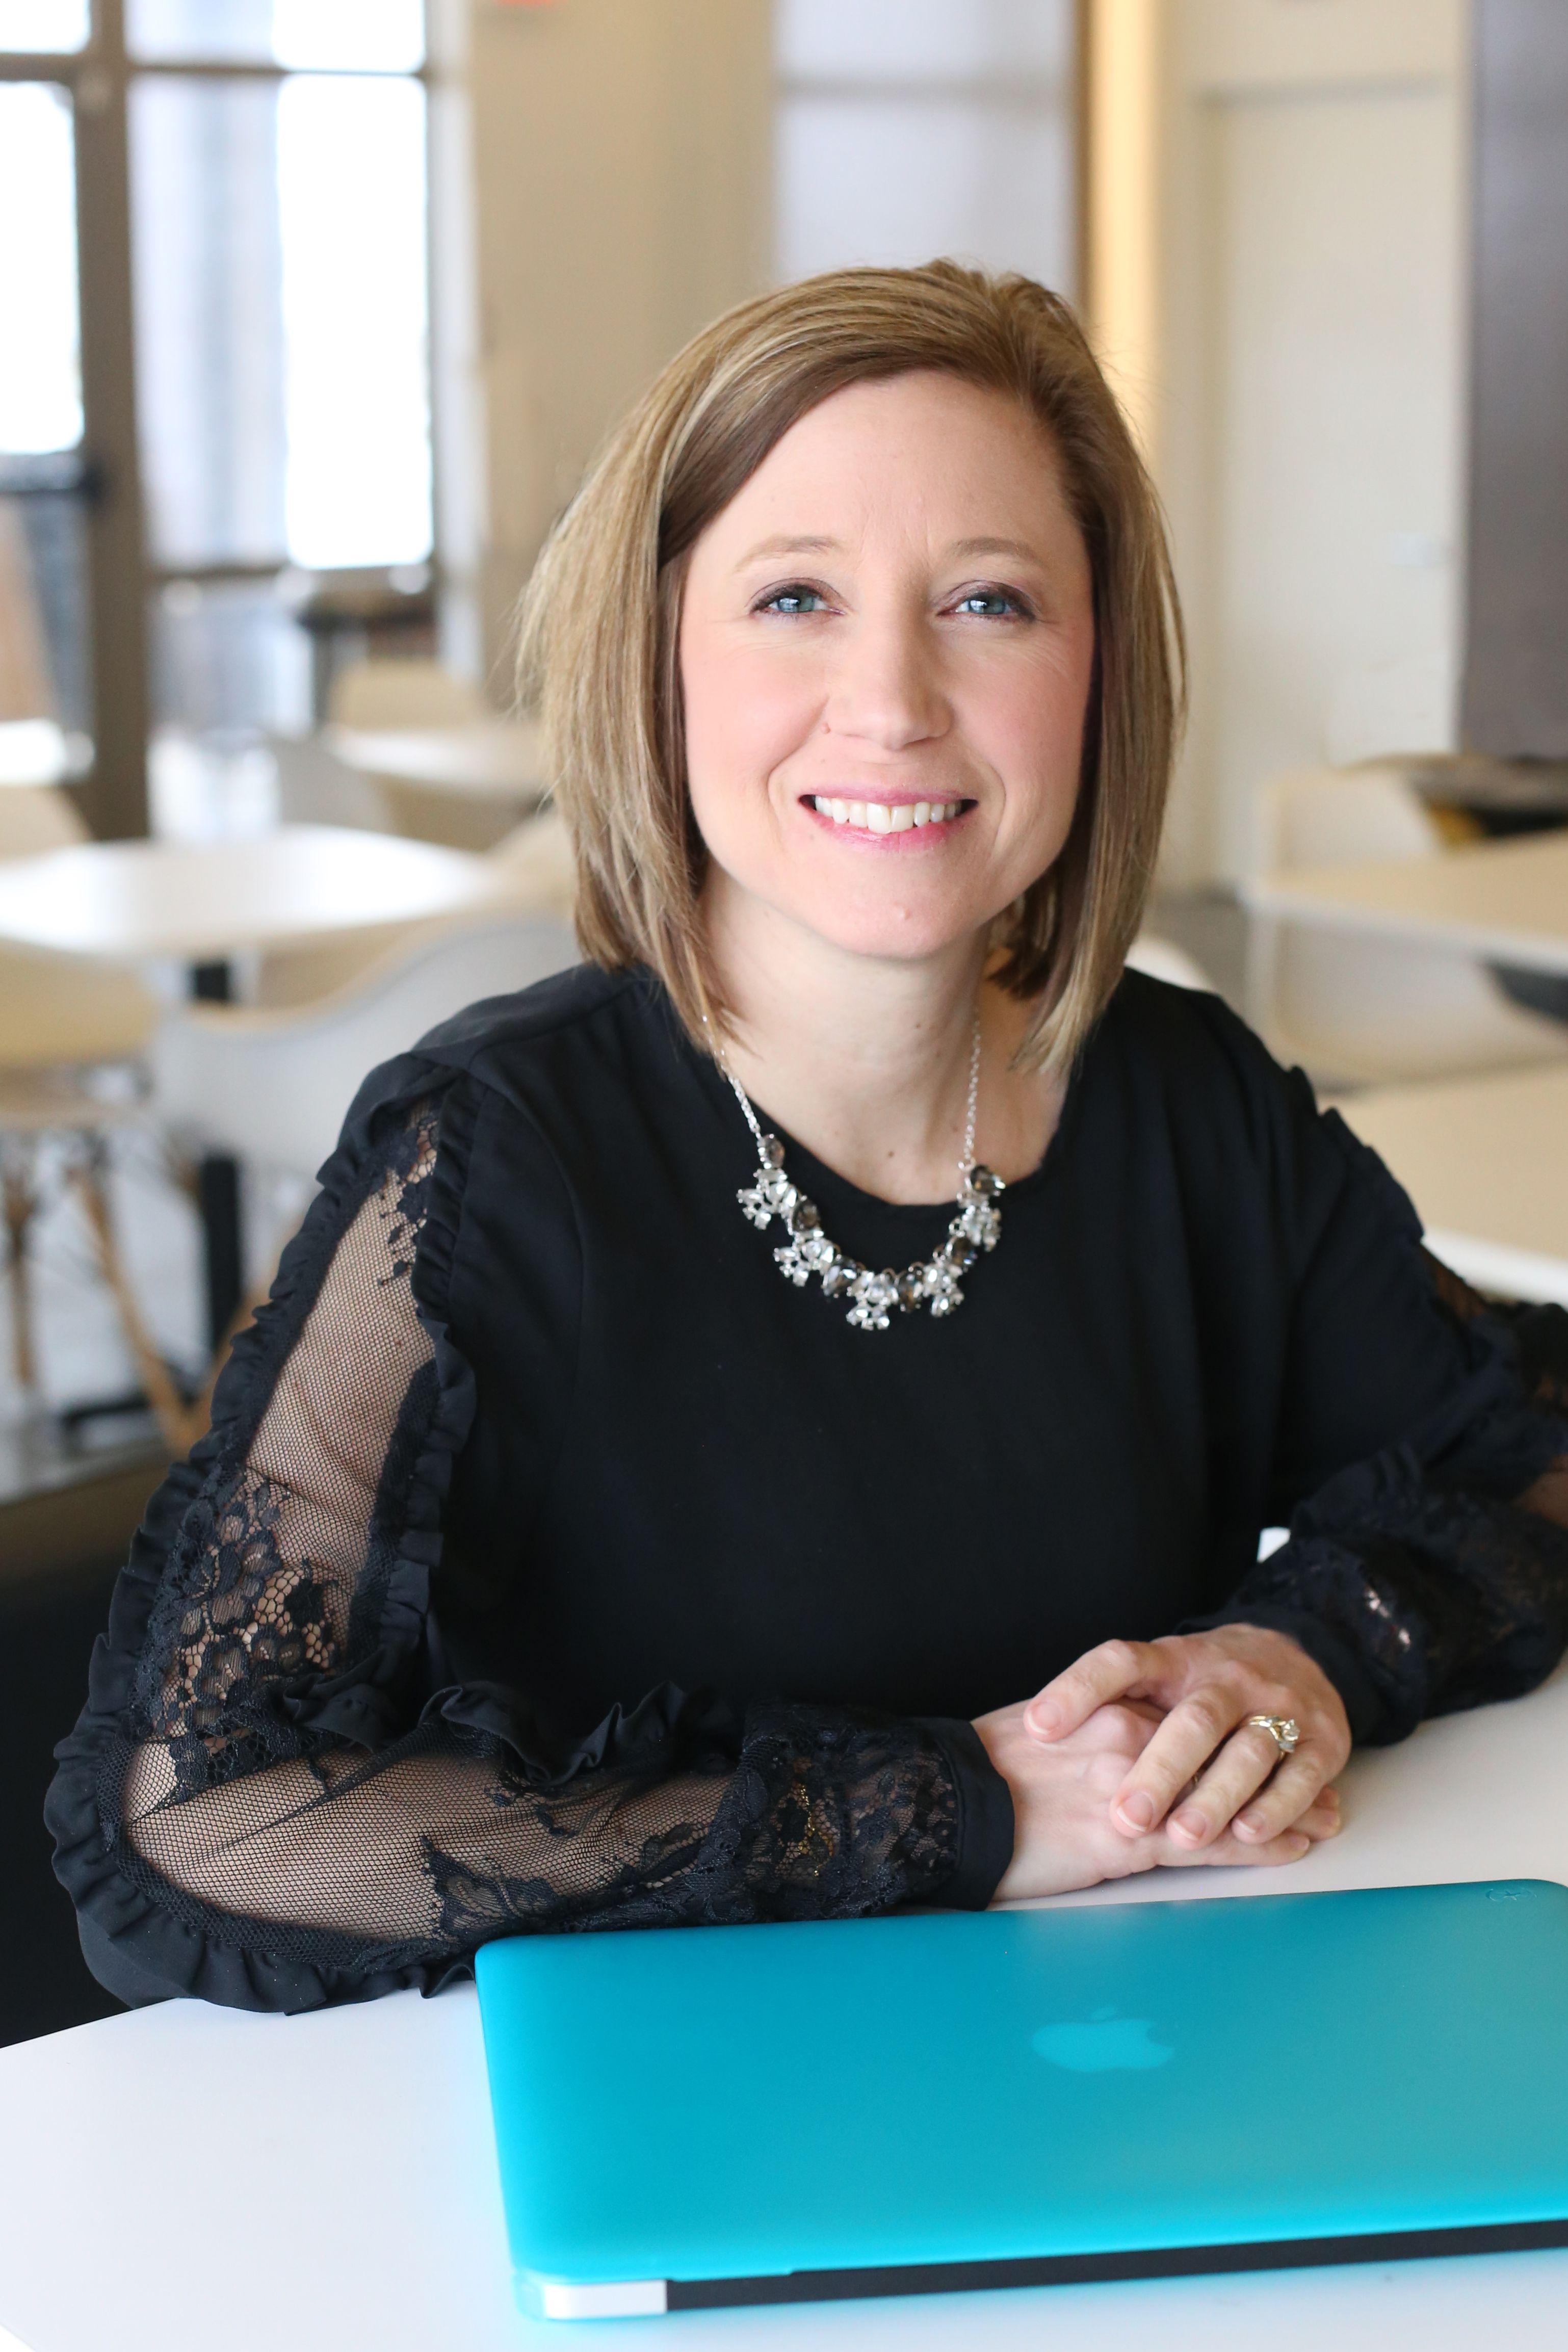 Stacey Regennitter, Director of Programs